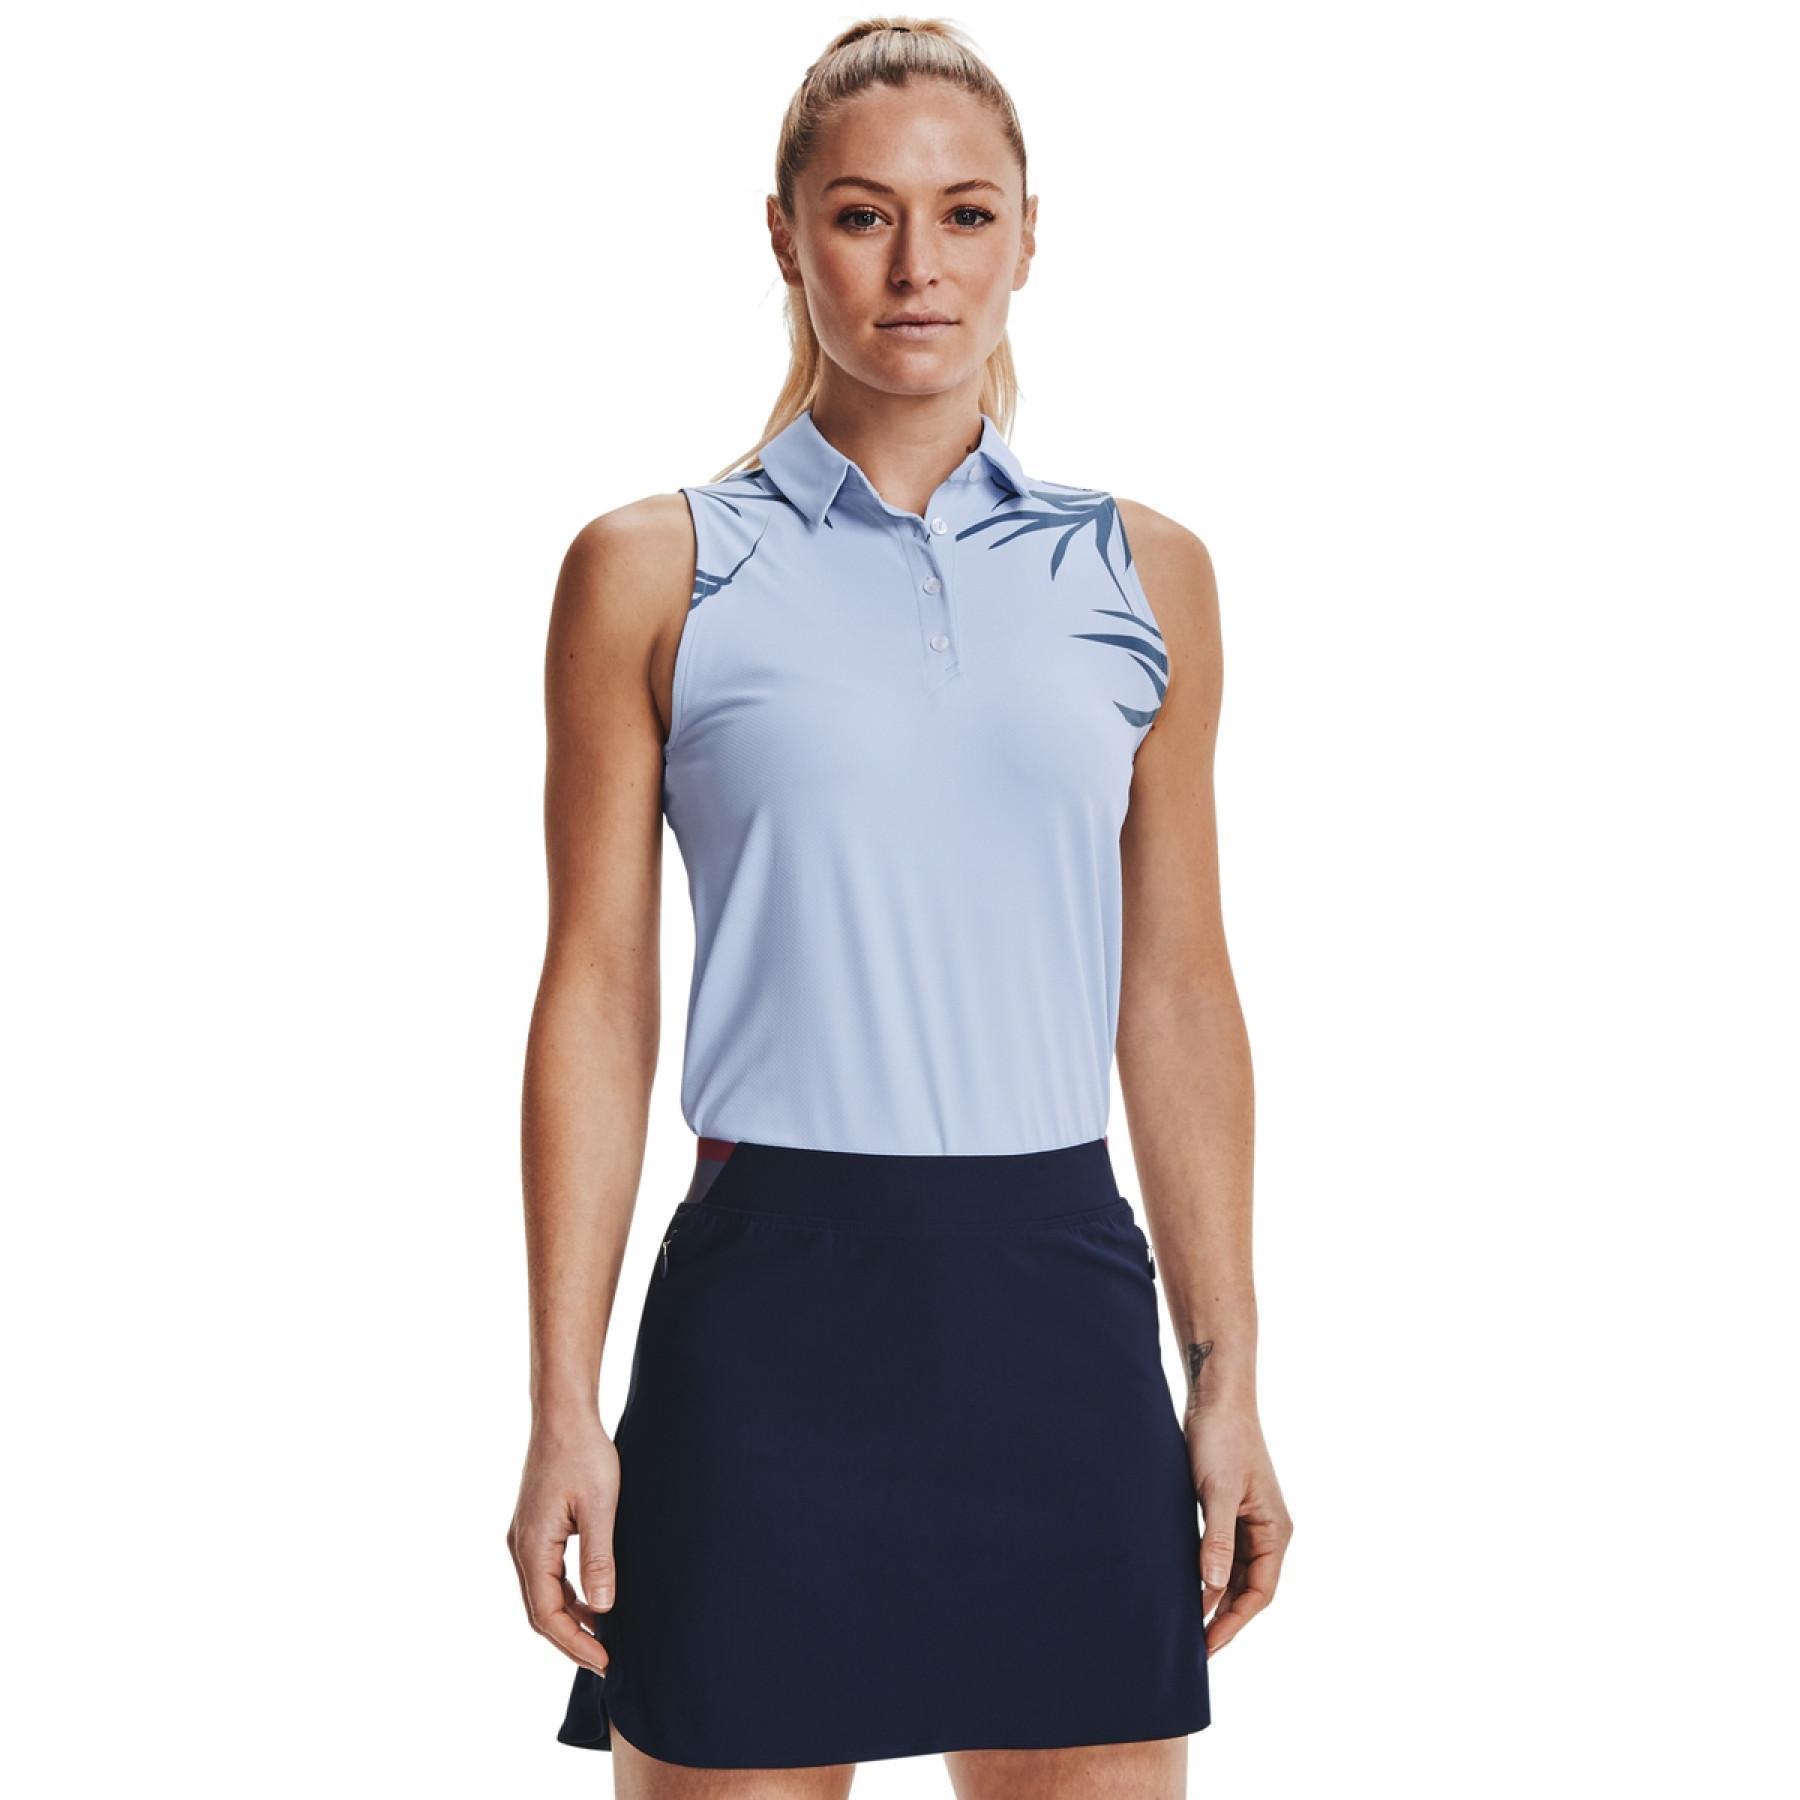 Women's Under Armour sleeveless polo shirt iso-chill